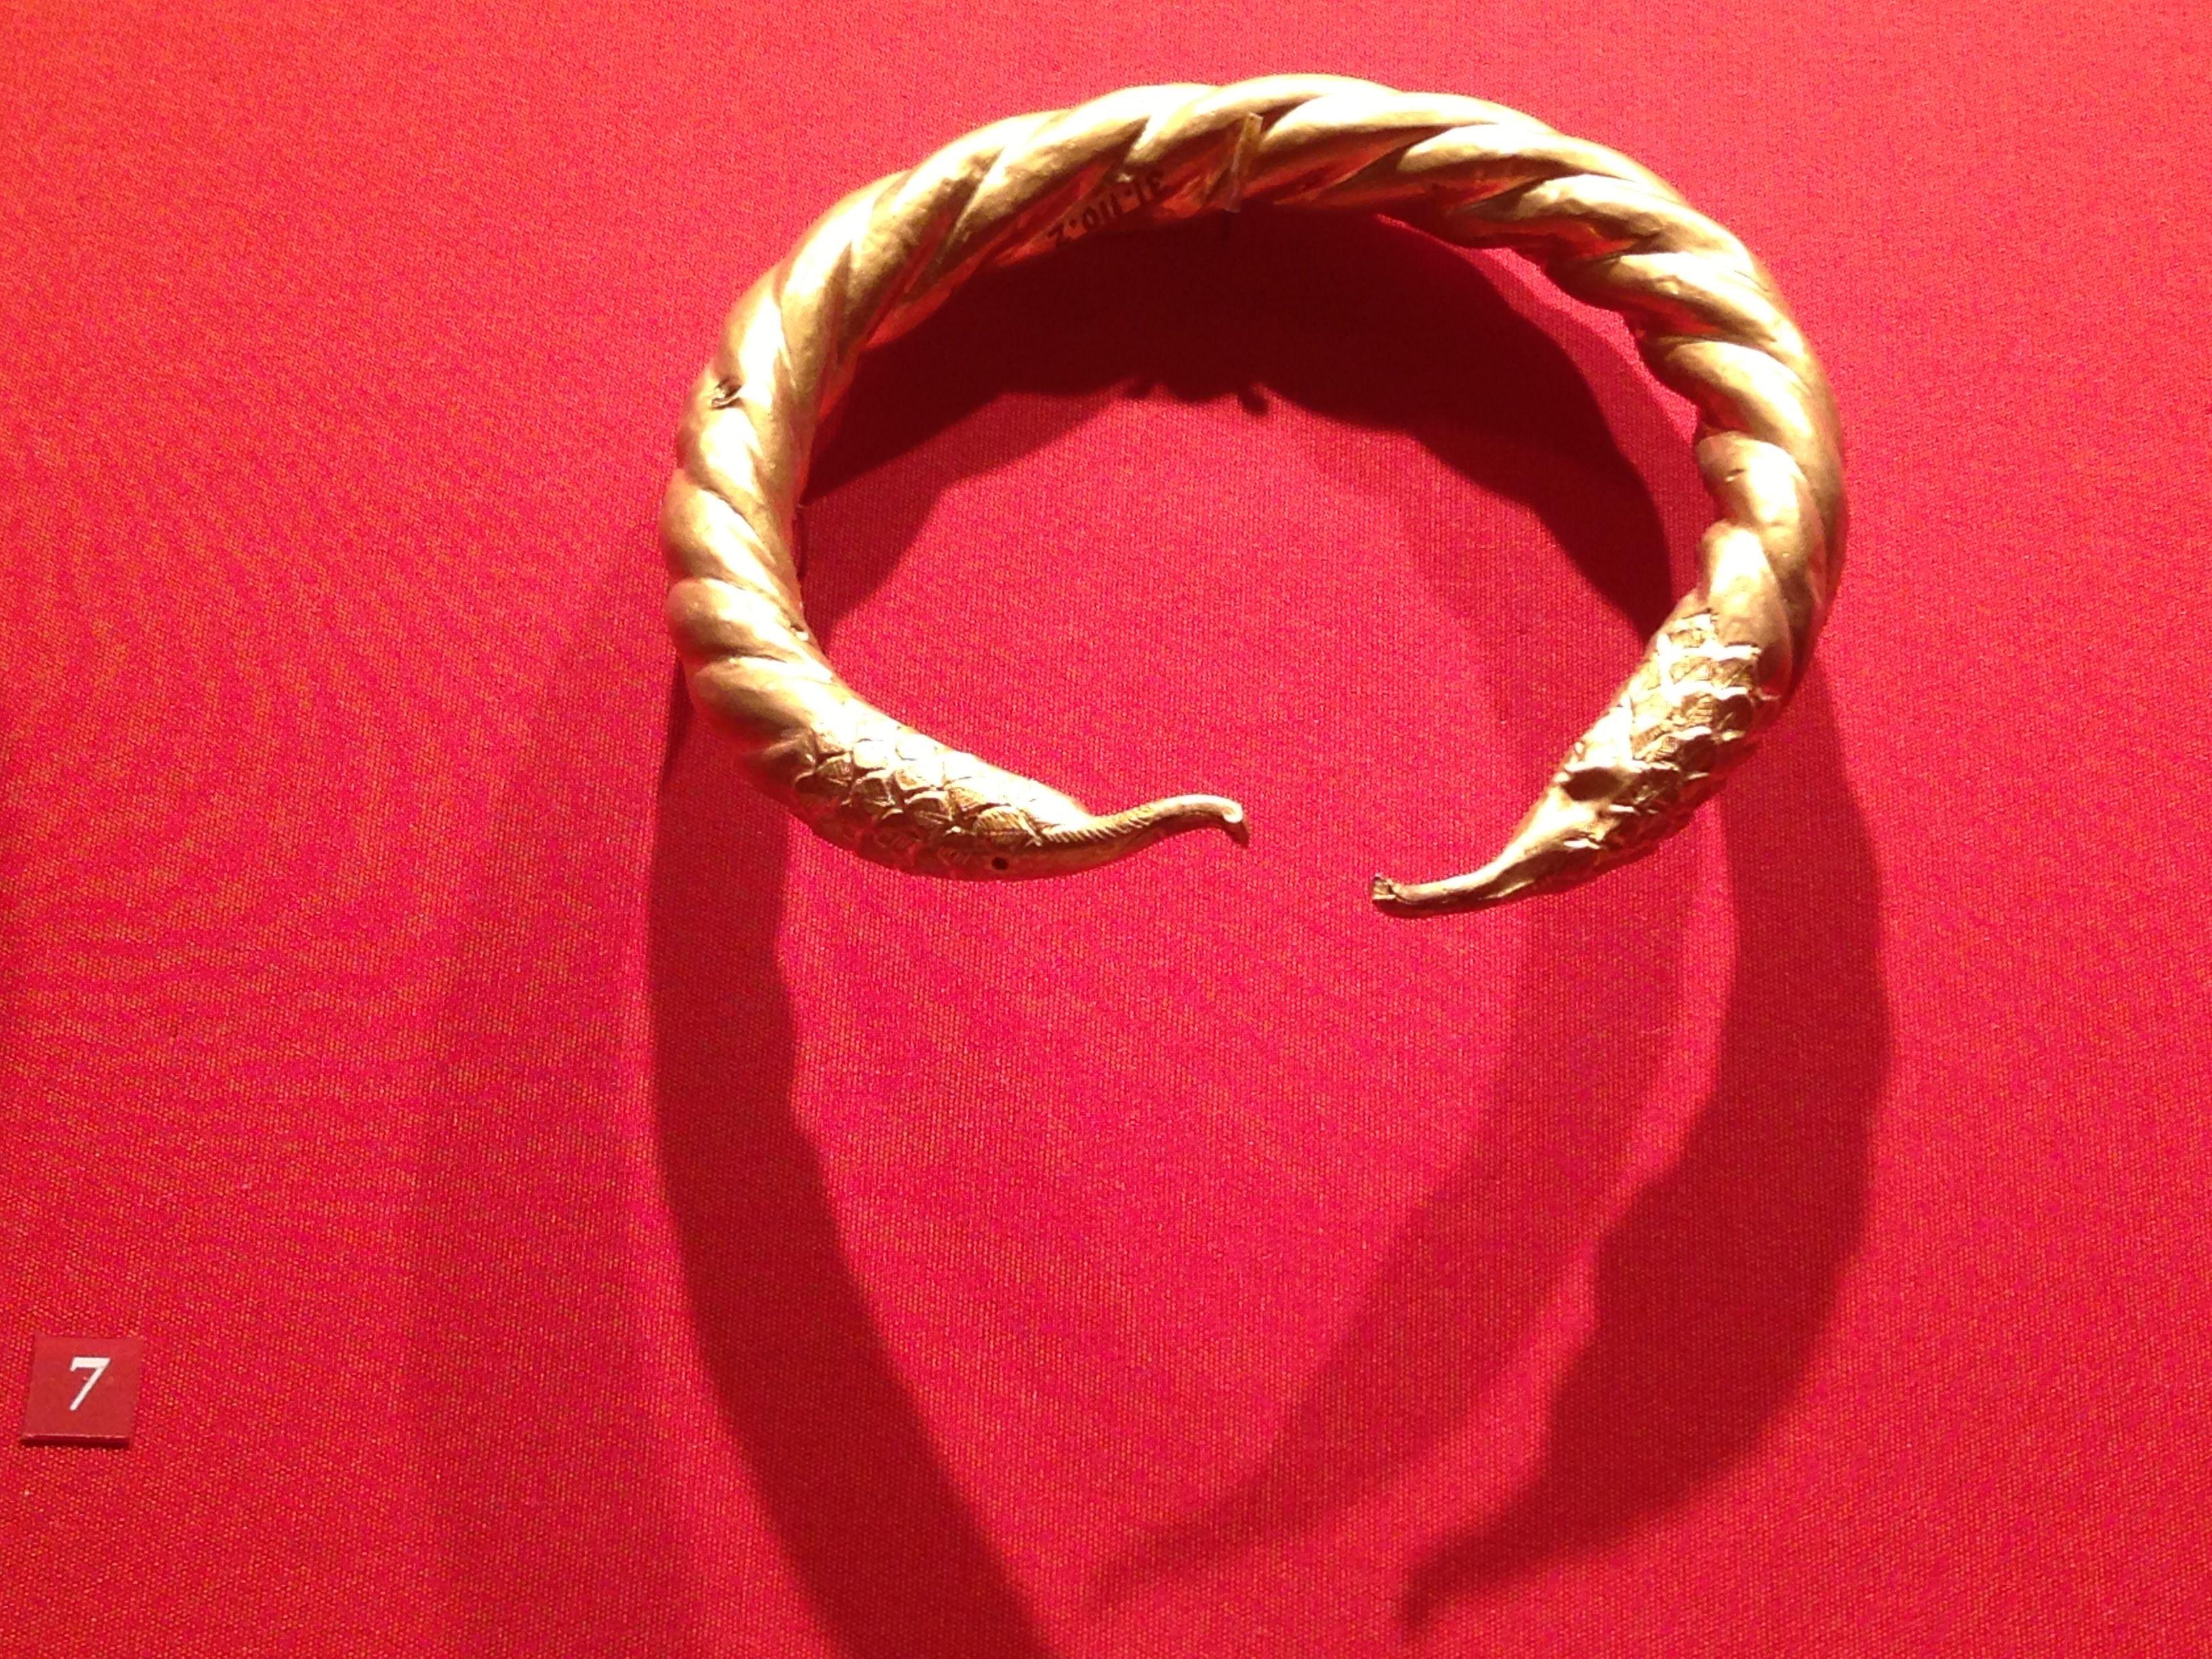 Greek bracelet, metropolitan museum